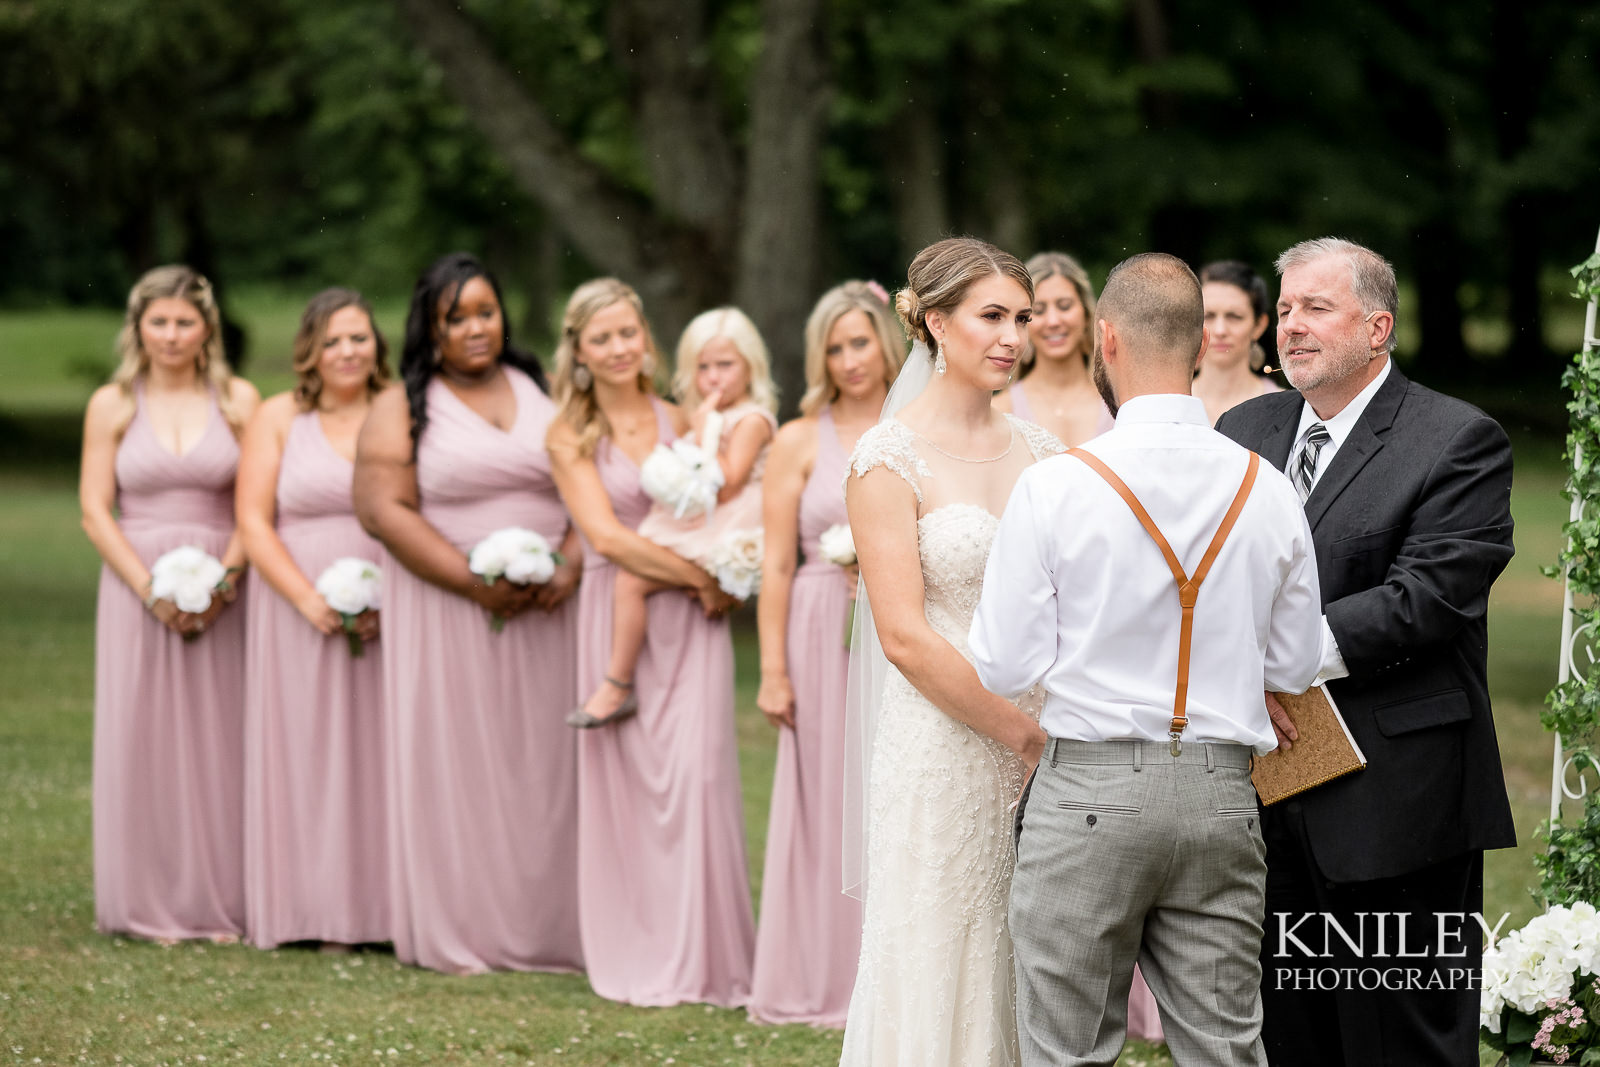 047 - Ontario Golf Club Wedding Pictures - XT2A6672.jpg